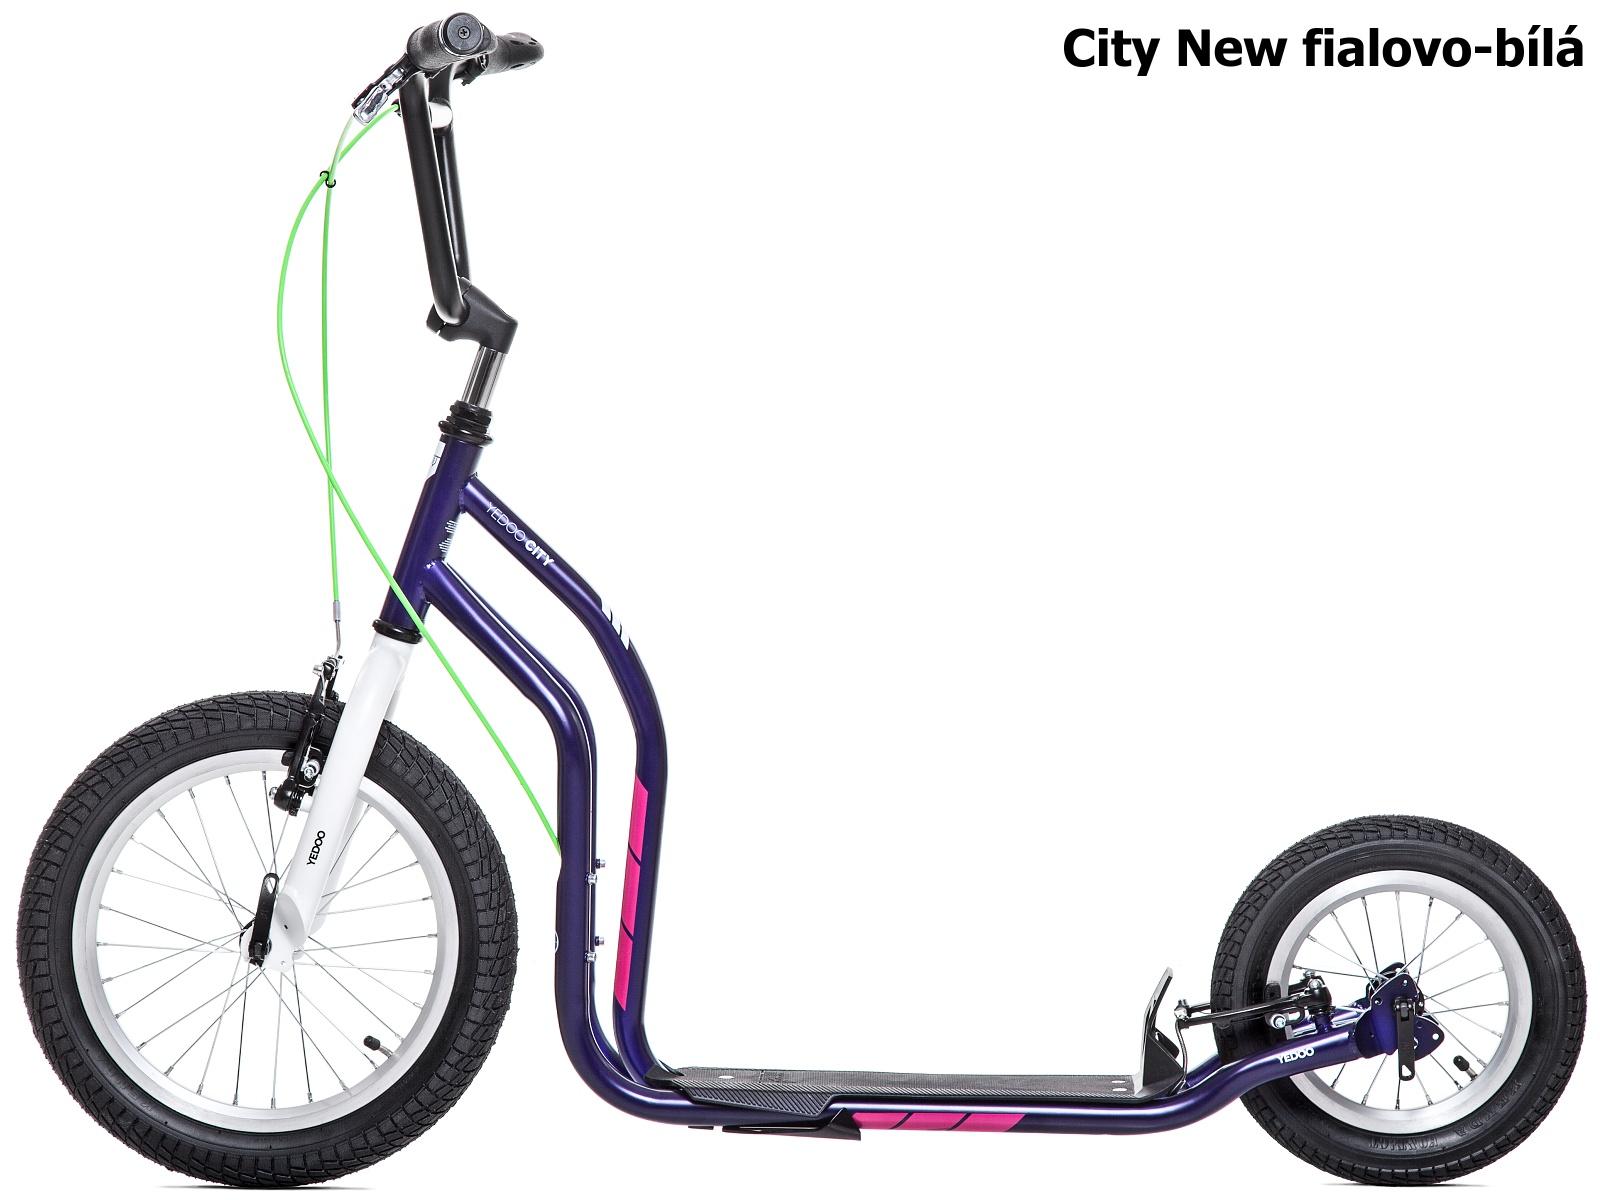 Koloběžka YEDOO City New 16-12 fialovo-bílá